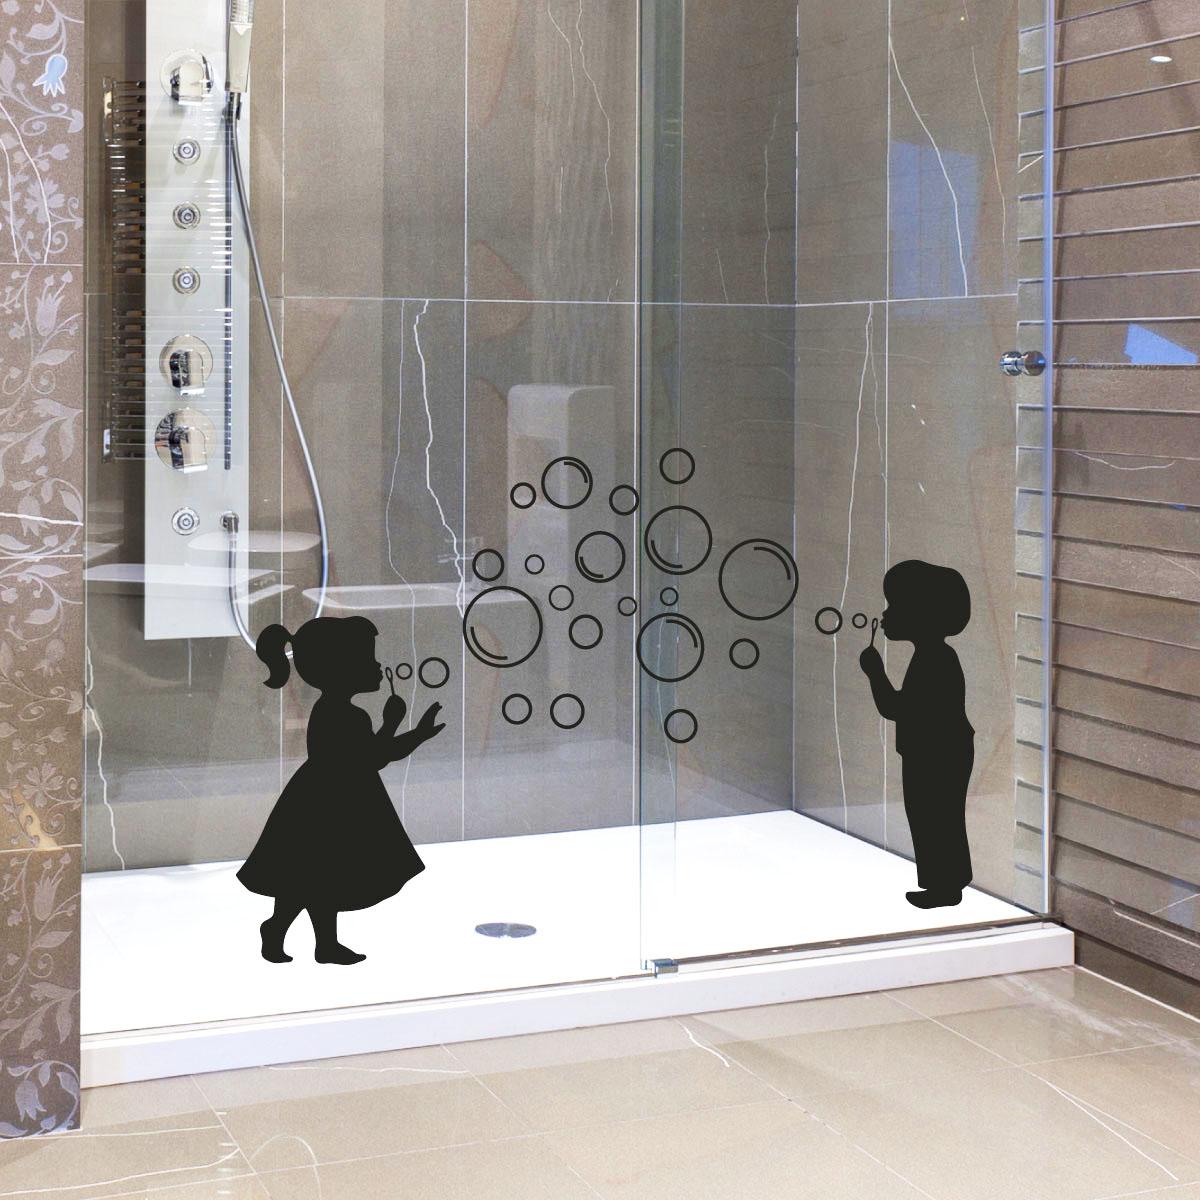 stickers muraux pour salle de bain sticker mural fille. Black Bedroom Furniture Sets. Home Design Ideas